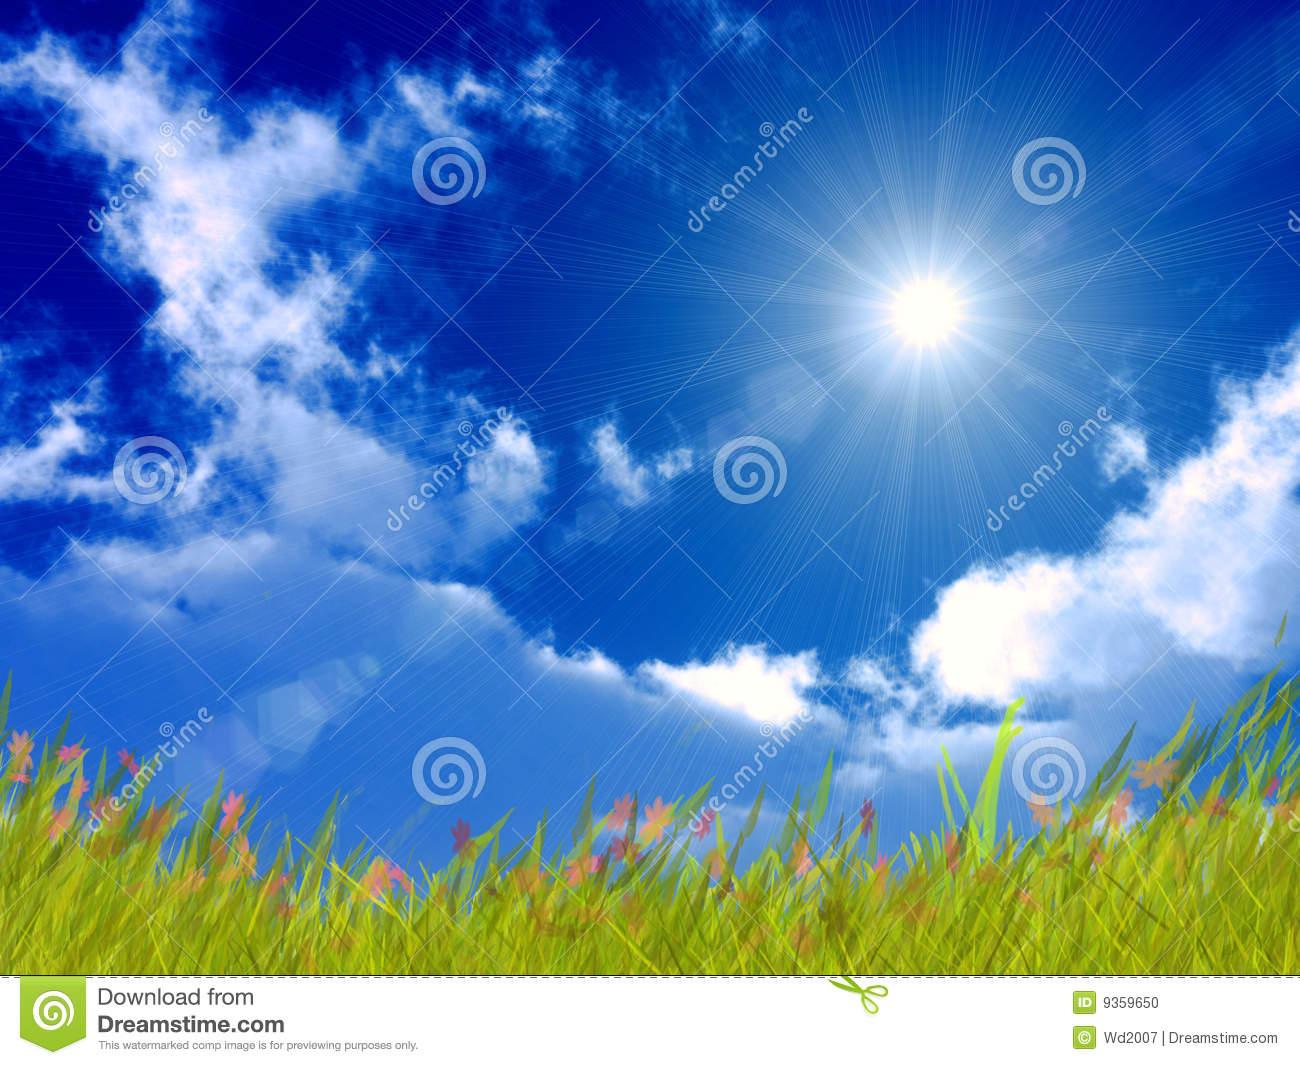 Bright Sunny Day Wallpaper - WallpaperSafari